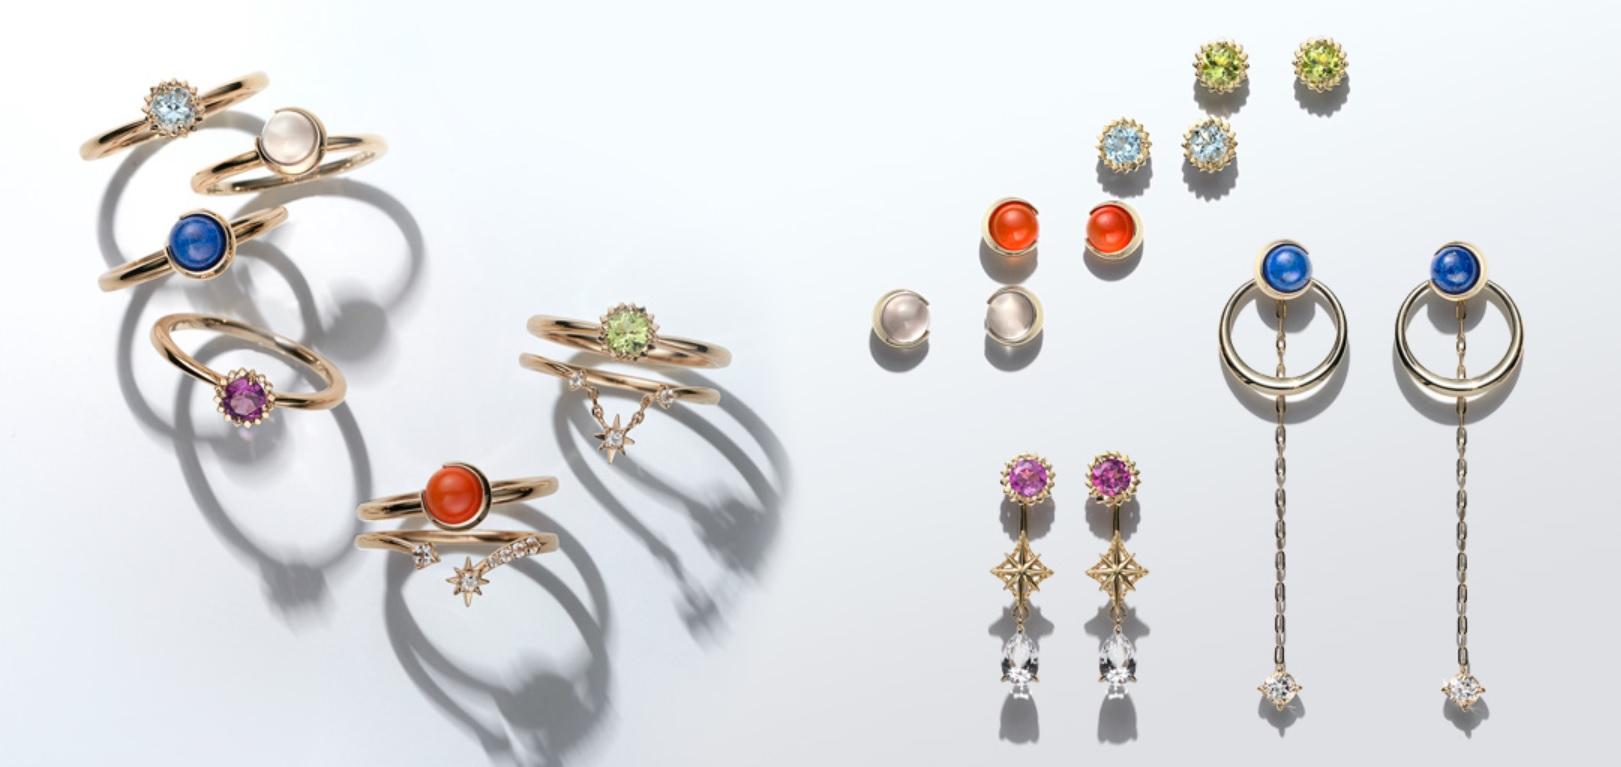 出典:https://www.star-jewelry.com